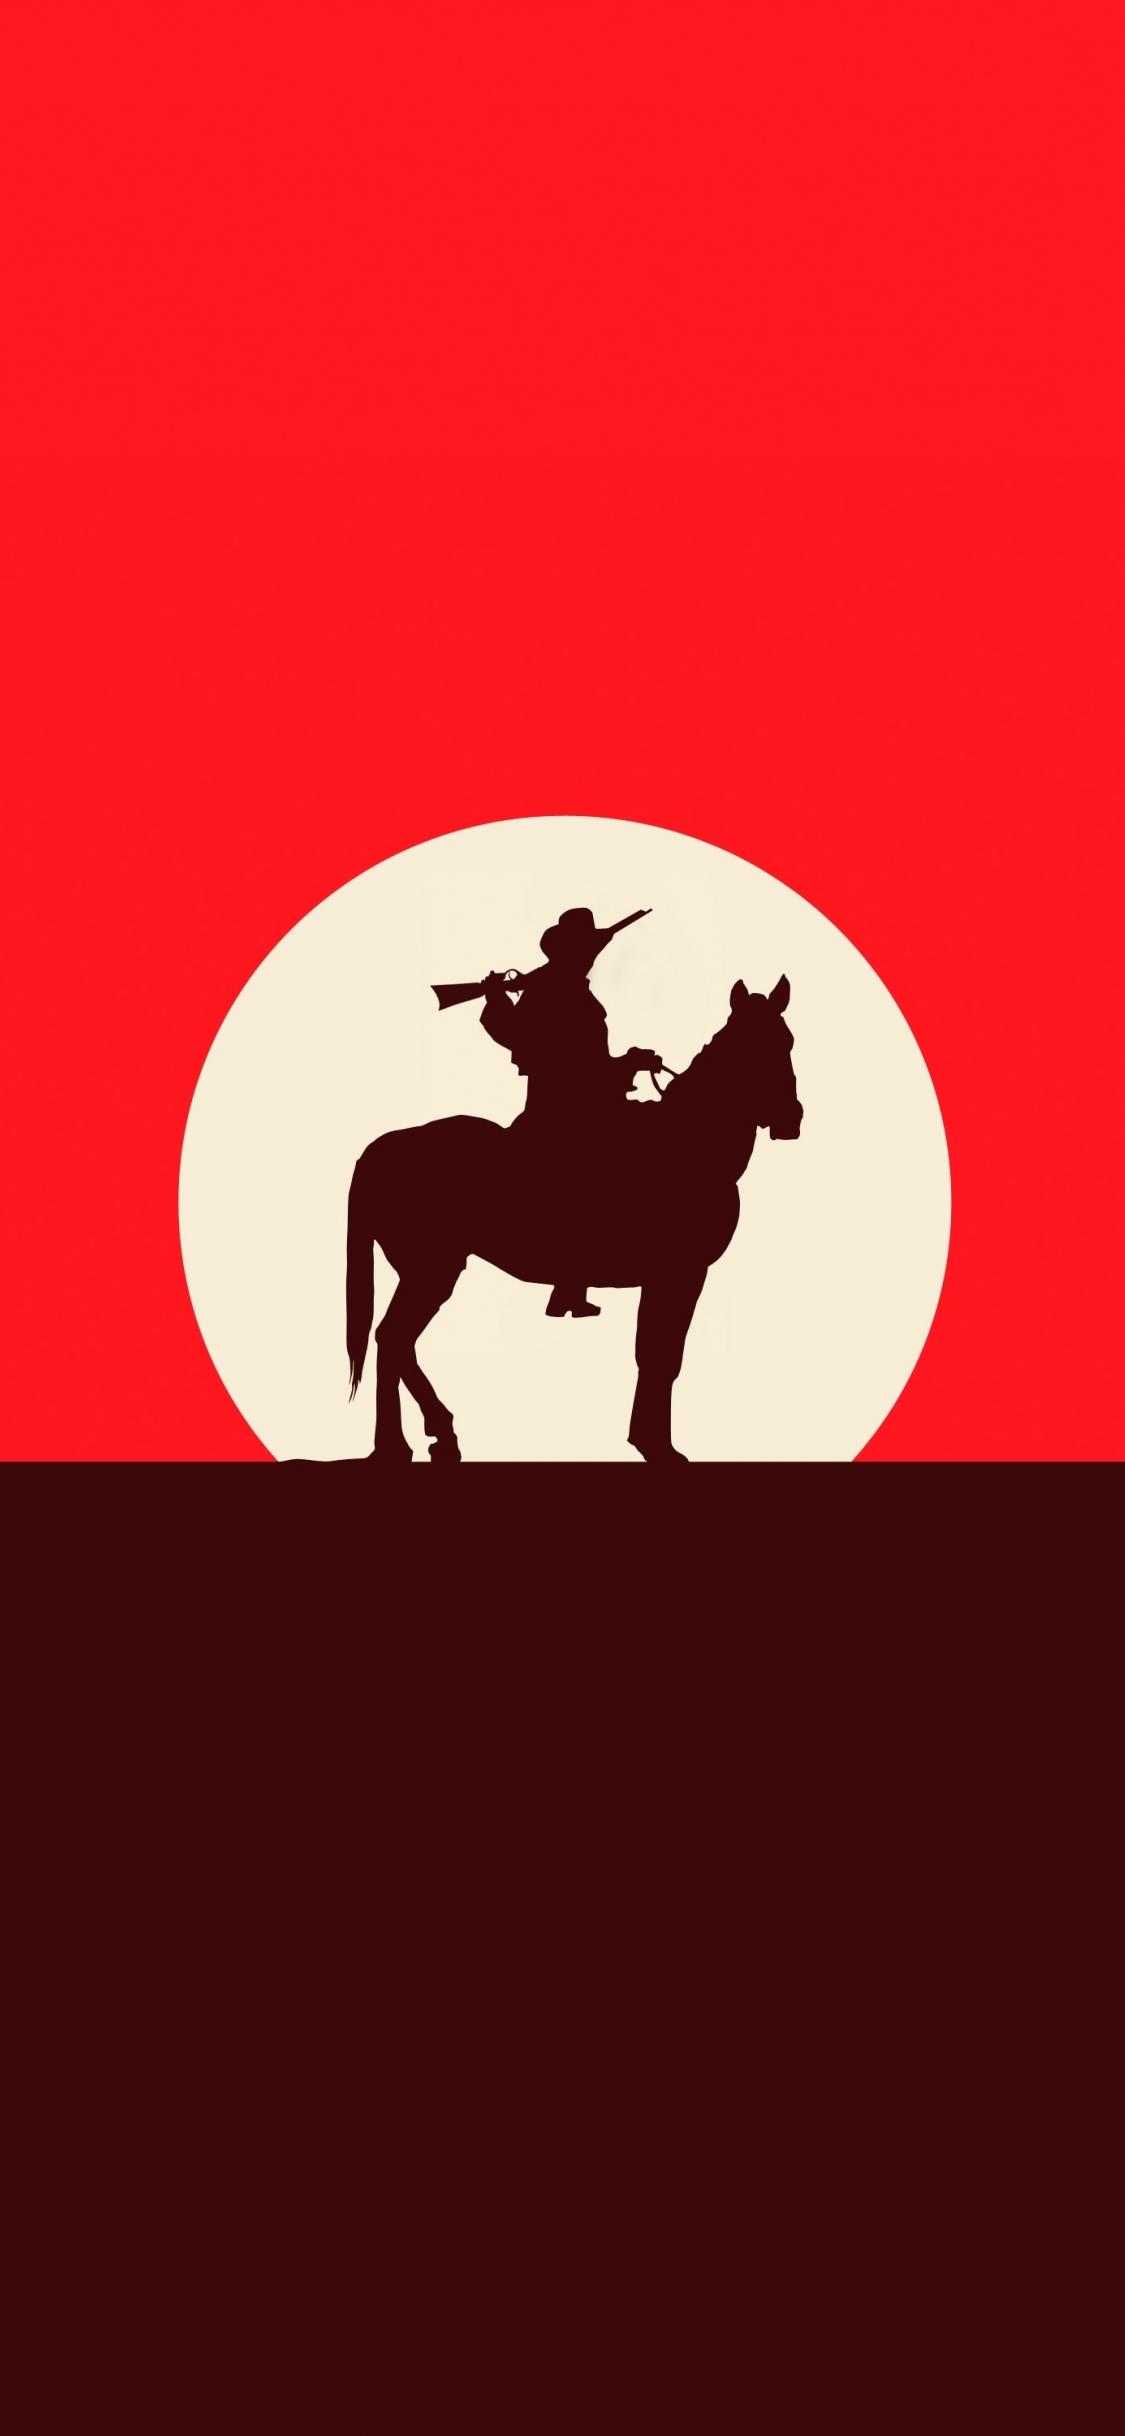 Download 1125x2436 Wallpaper Red Dead Redemption 2 Sunset